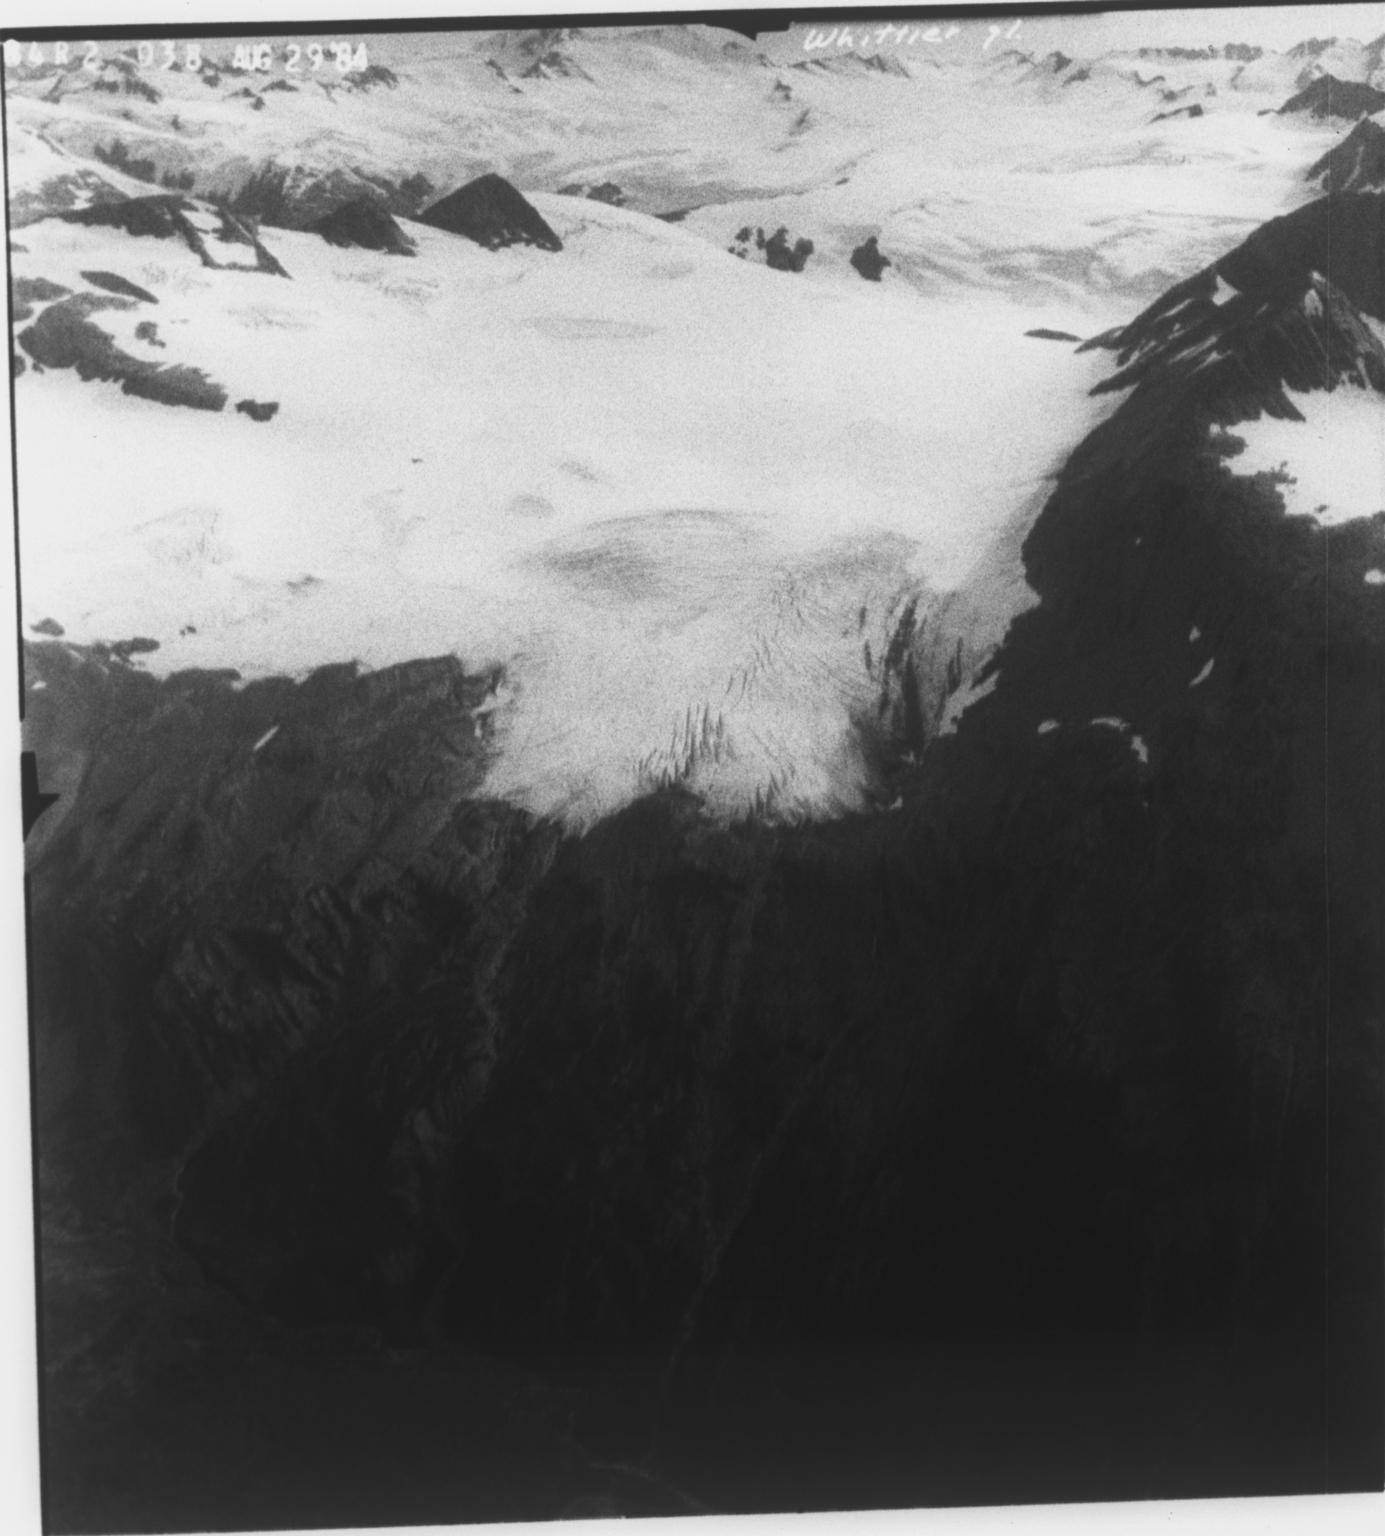 Whittier Glacier, Alaska, United States